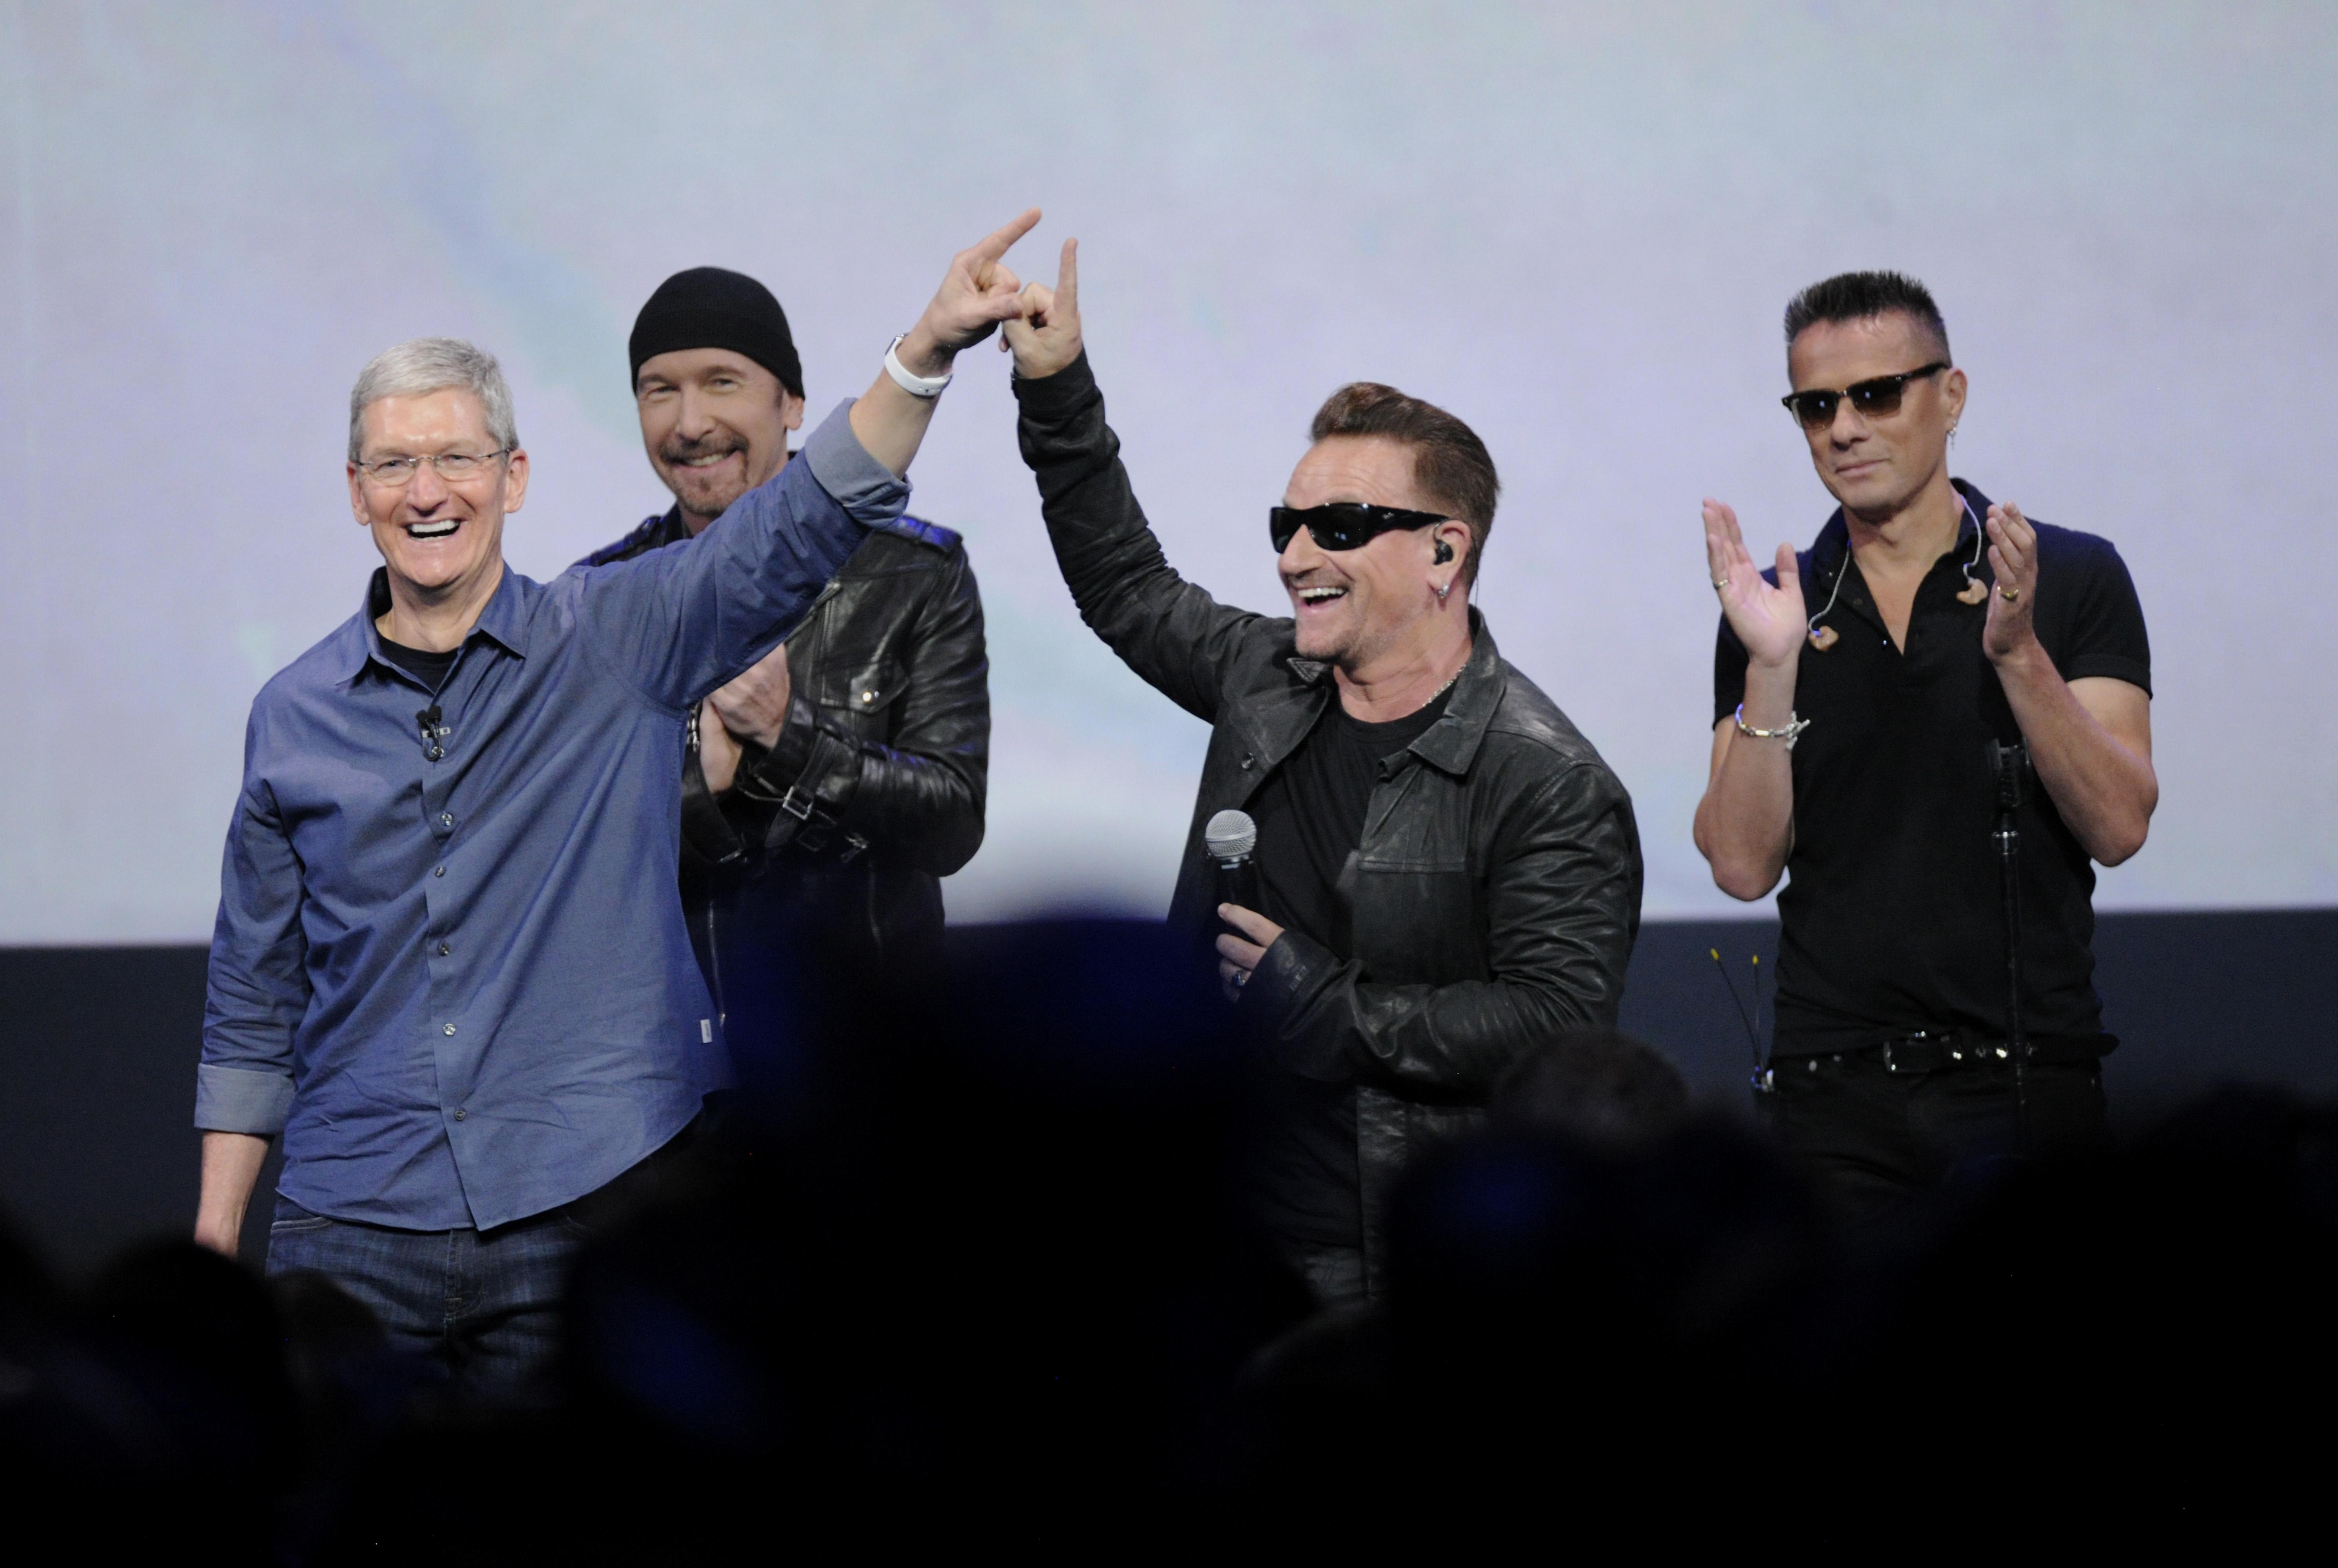 Bono Reveals Secrets of U2's Surprise LP 'Songs of Innocence'